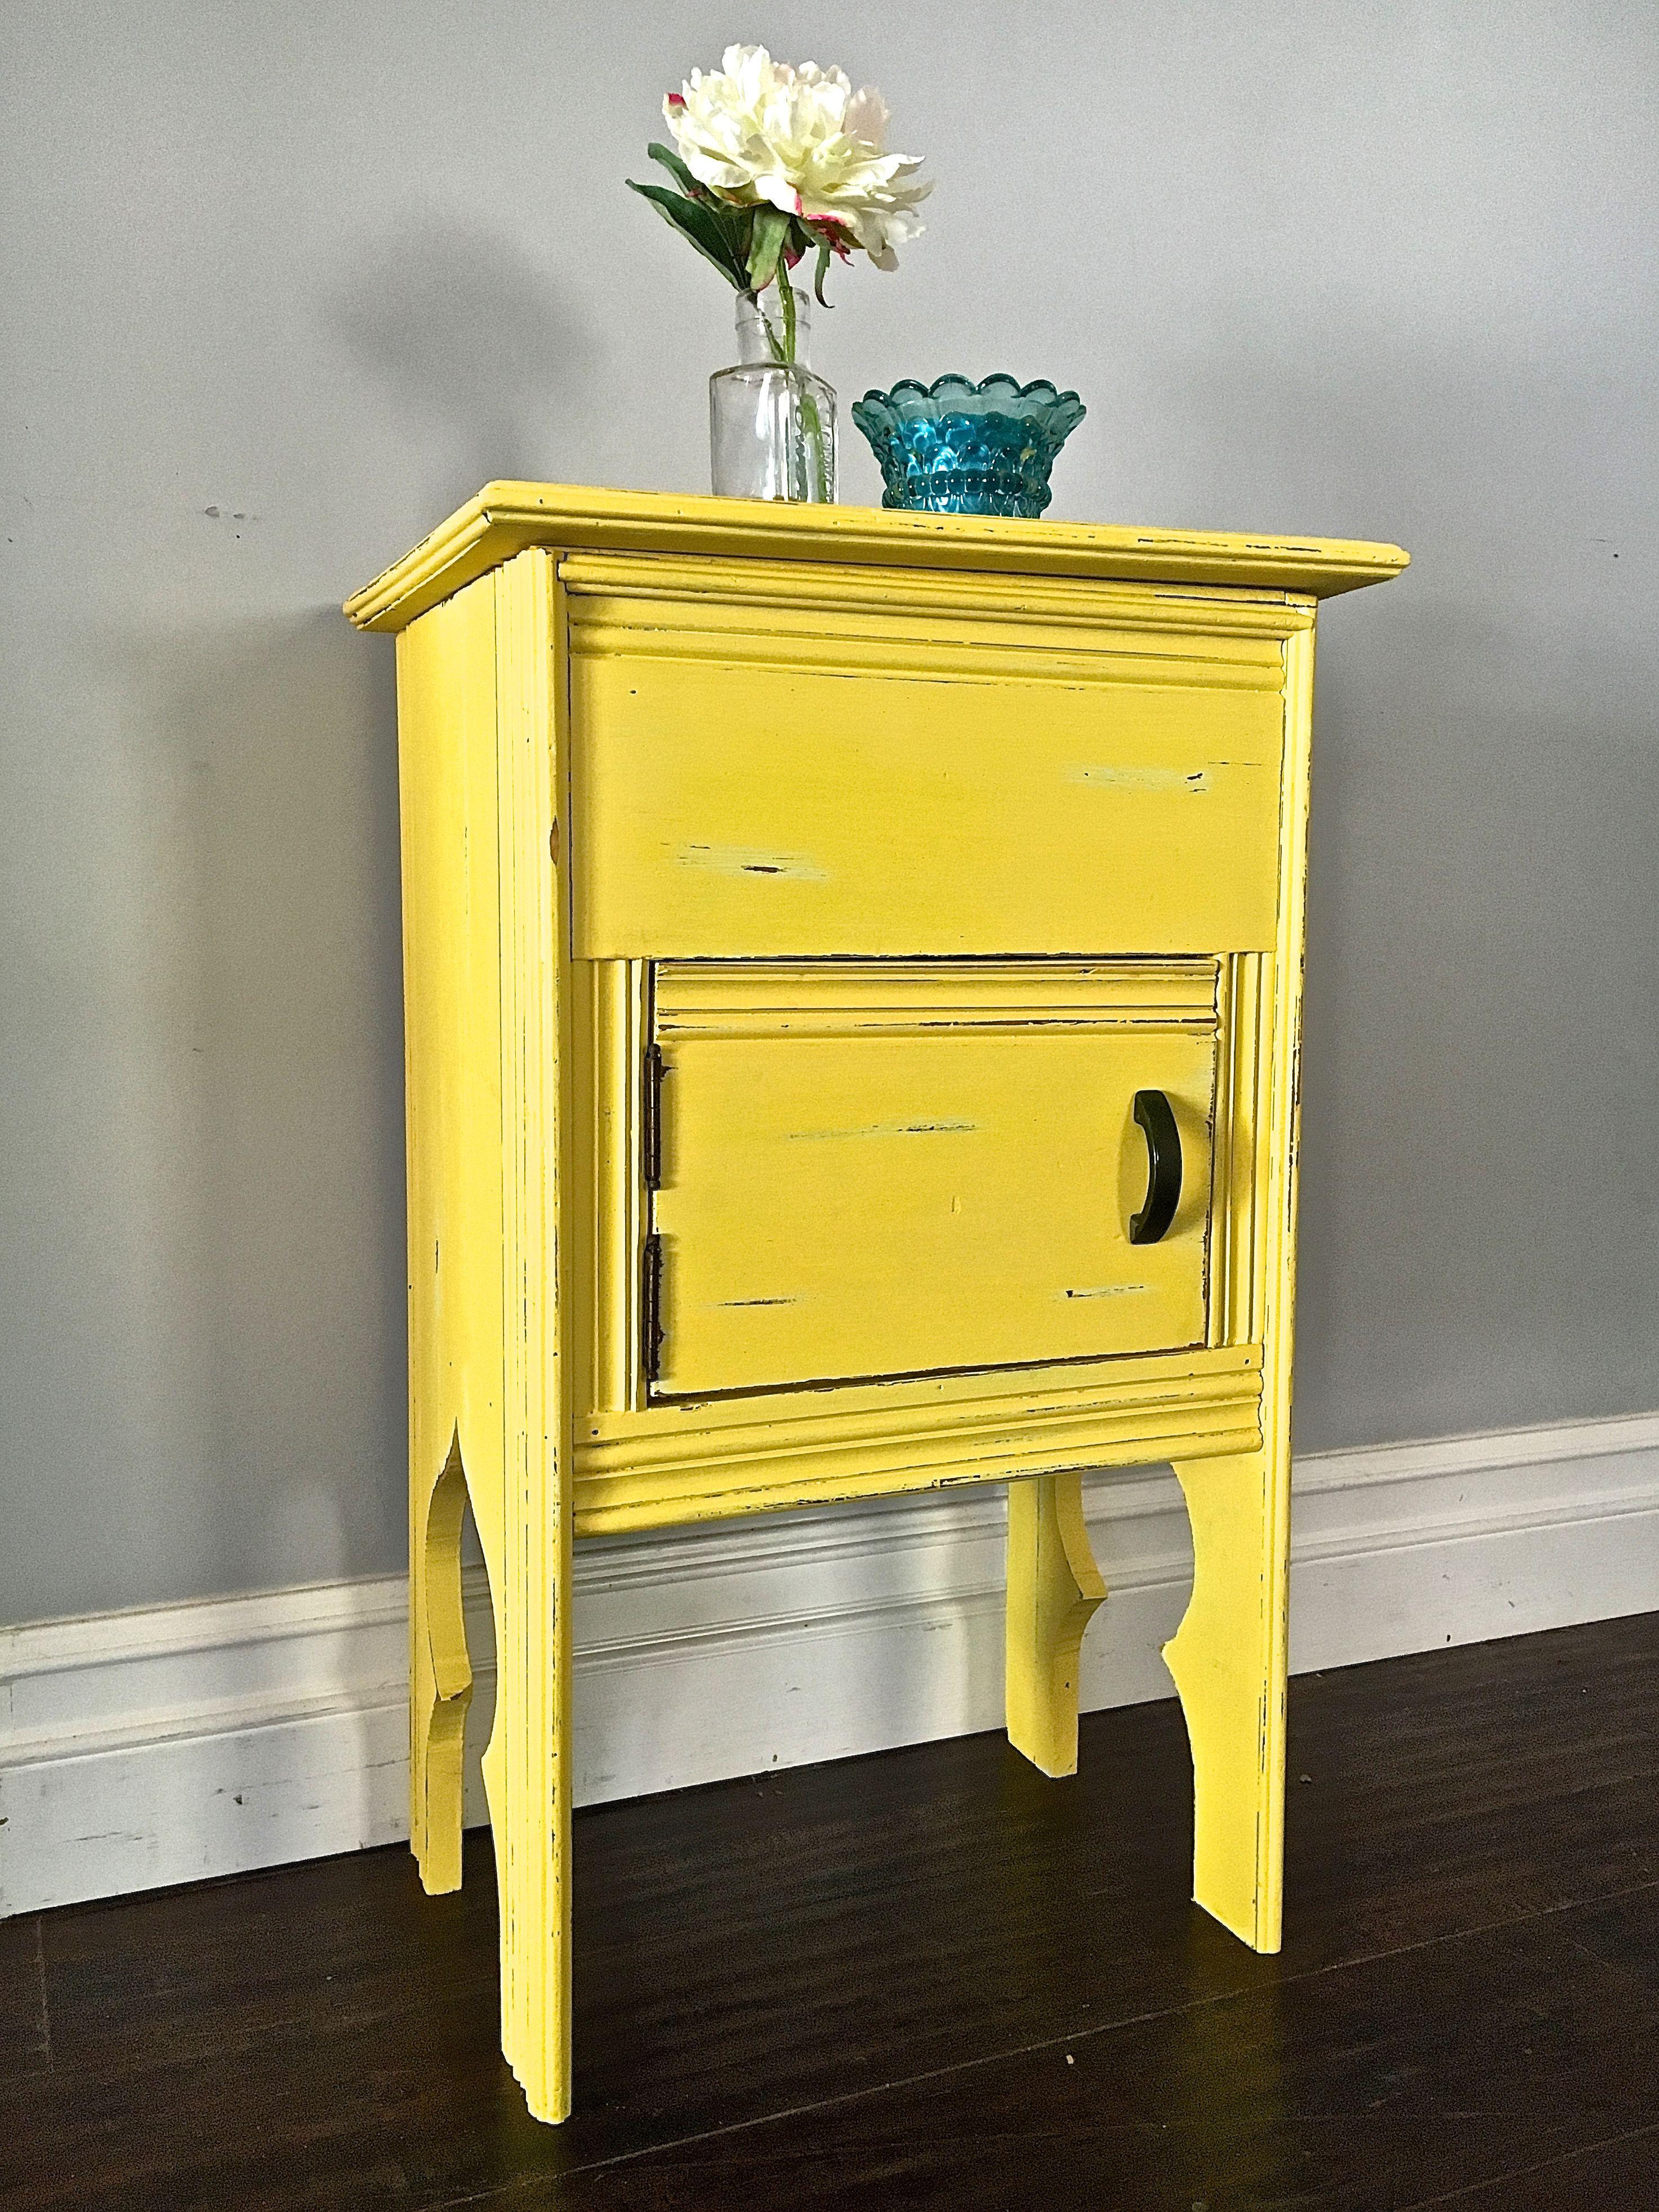 - Shabby Chic Yellow Accent Table - Custom Order For Araceli